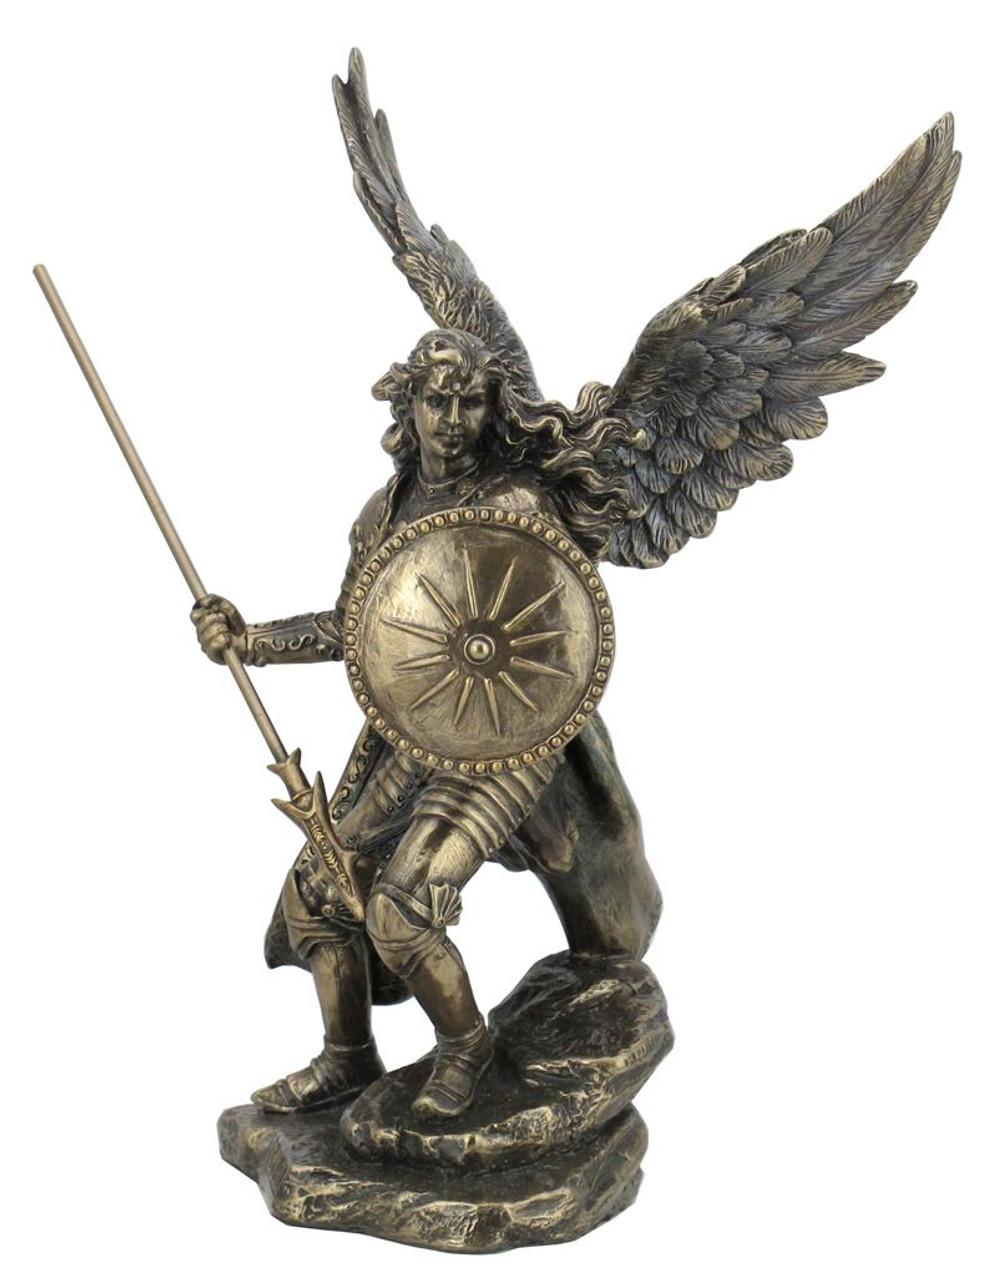 statue archangel raphael style usiwu76306a4 f c ziegler company